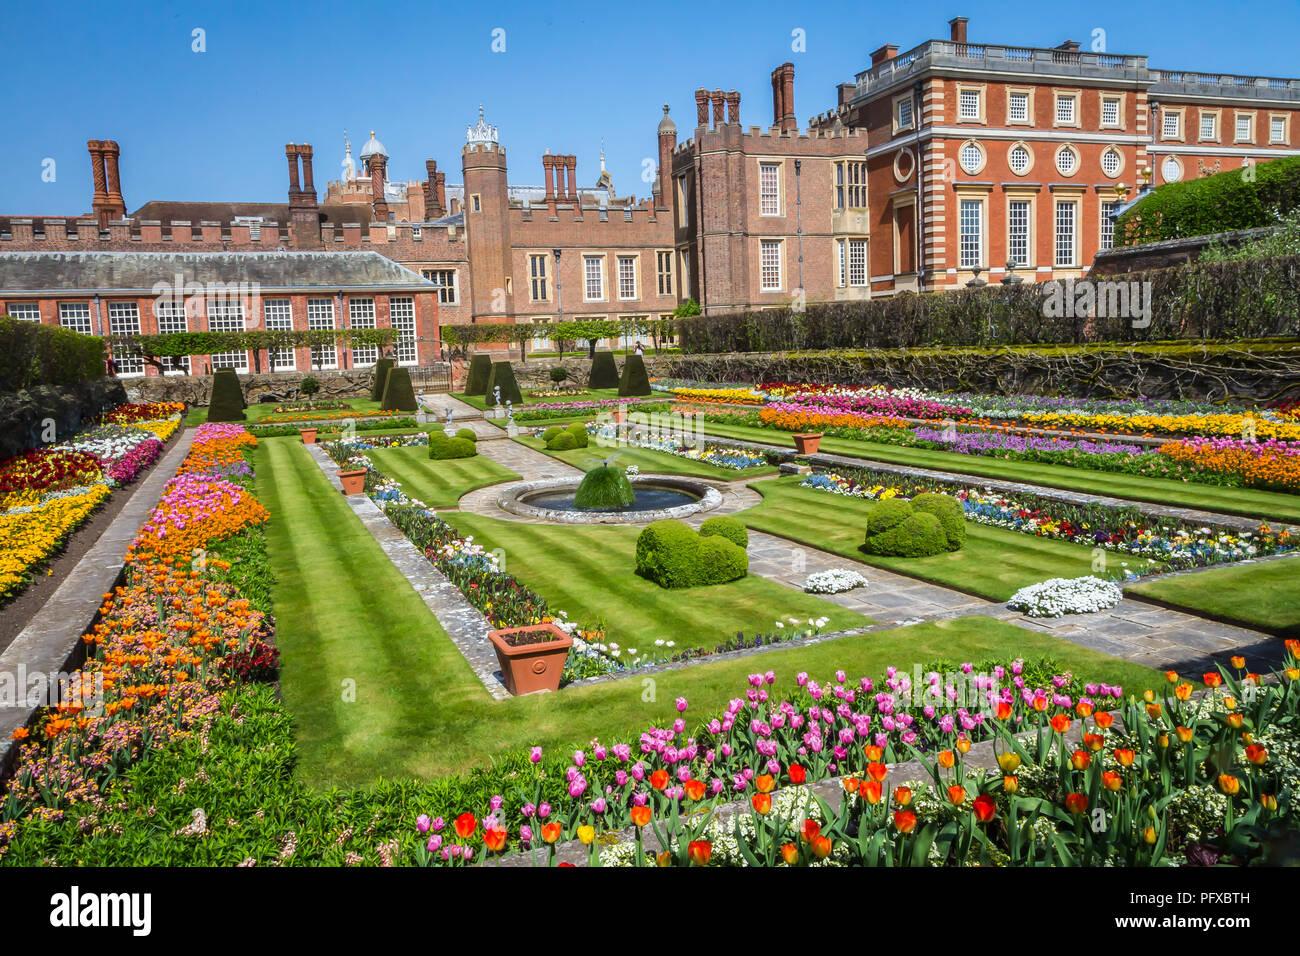 Hampton Court Palace, Richmond, London, UK - 22 April 2018 - the palace gardens Stock Photo